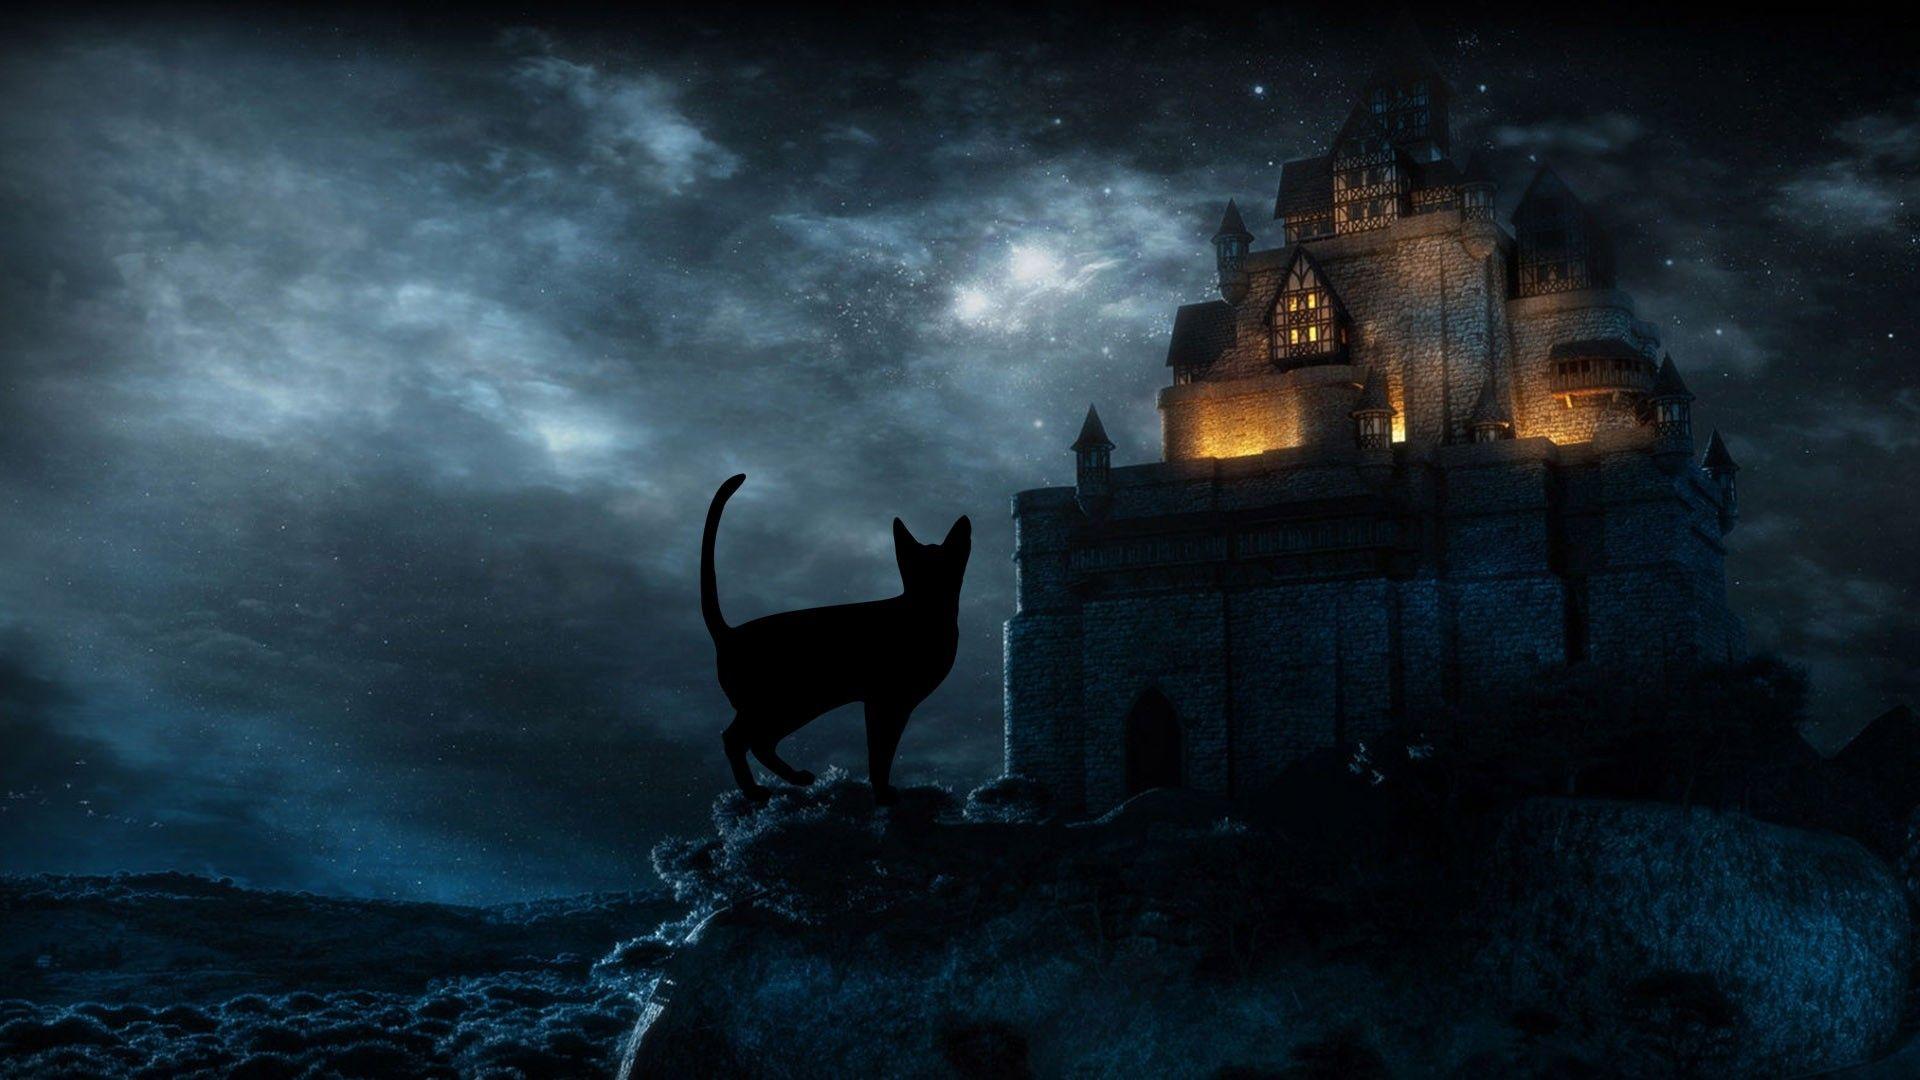 Black Cat Halloween Wallpapers Top Free Black Cat